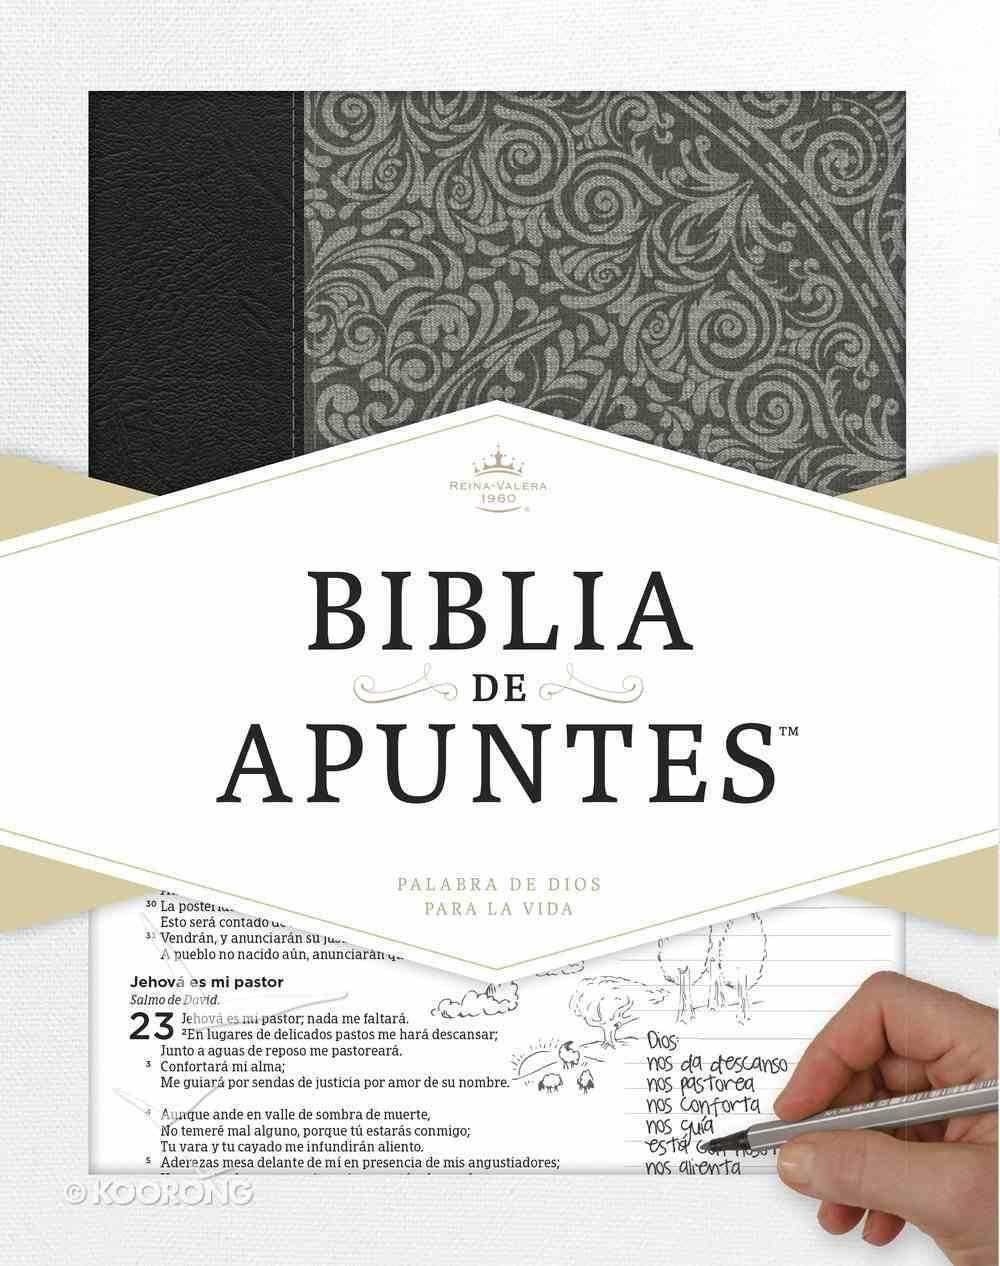 Rvr 1960 Biblia De Apuntes Gris (Notetaking Bible Grey) Hardback